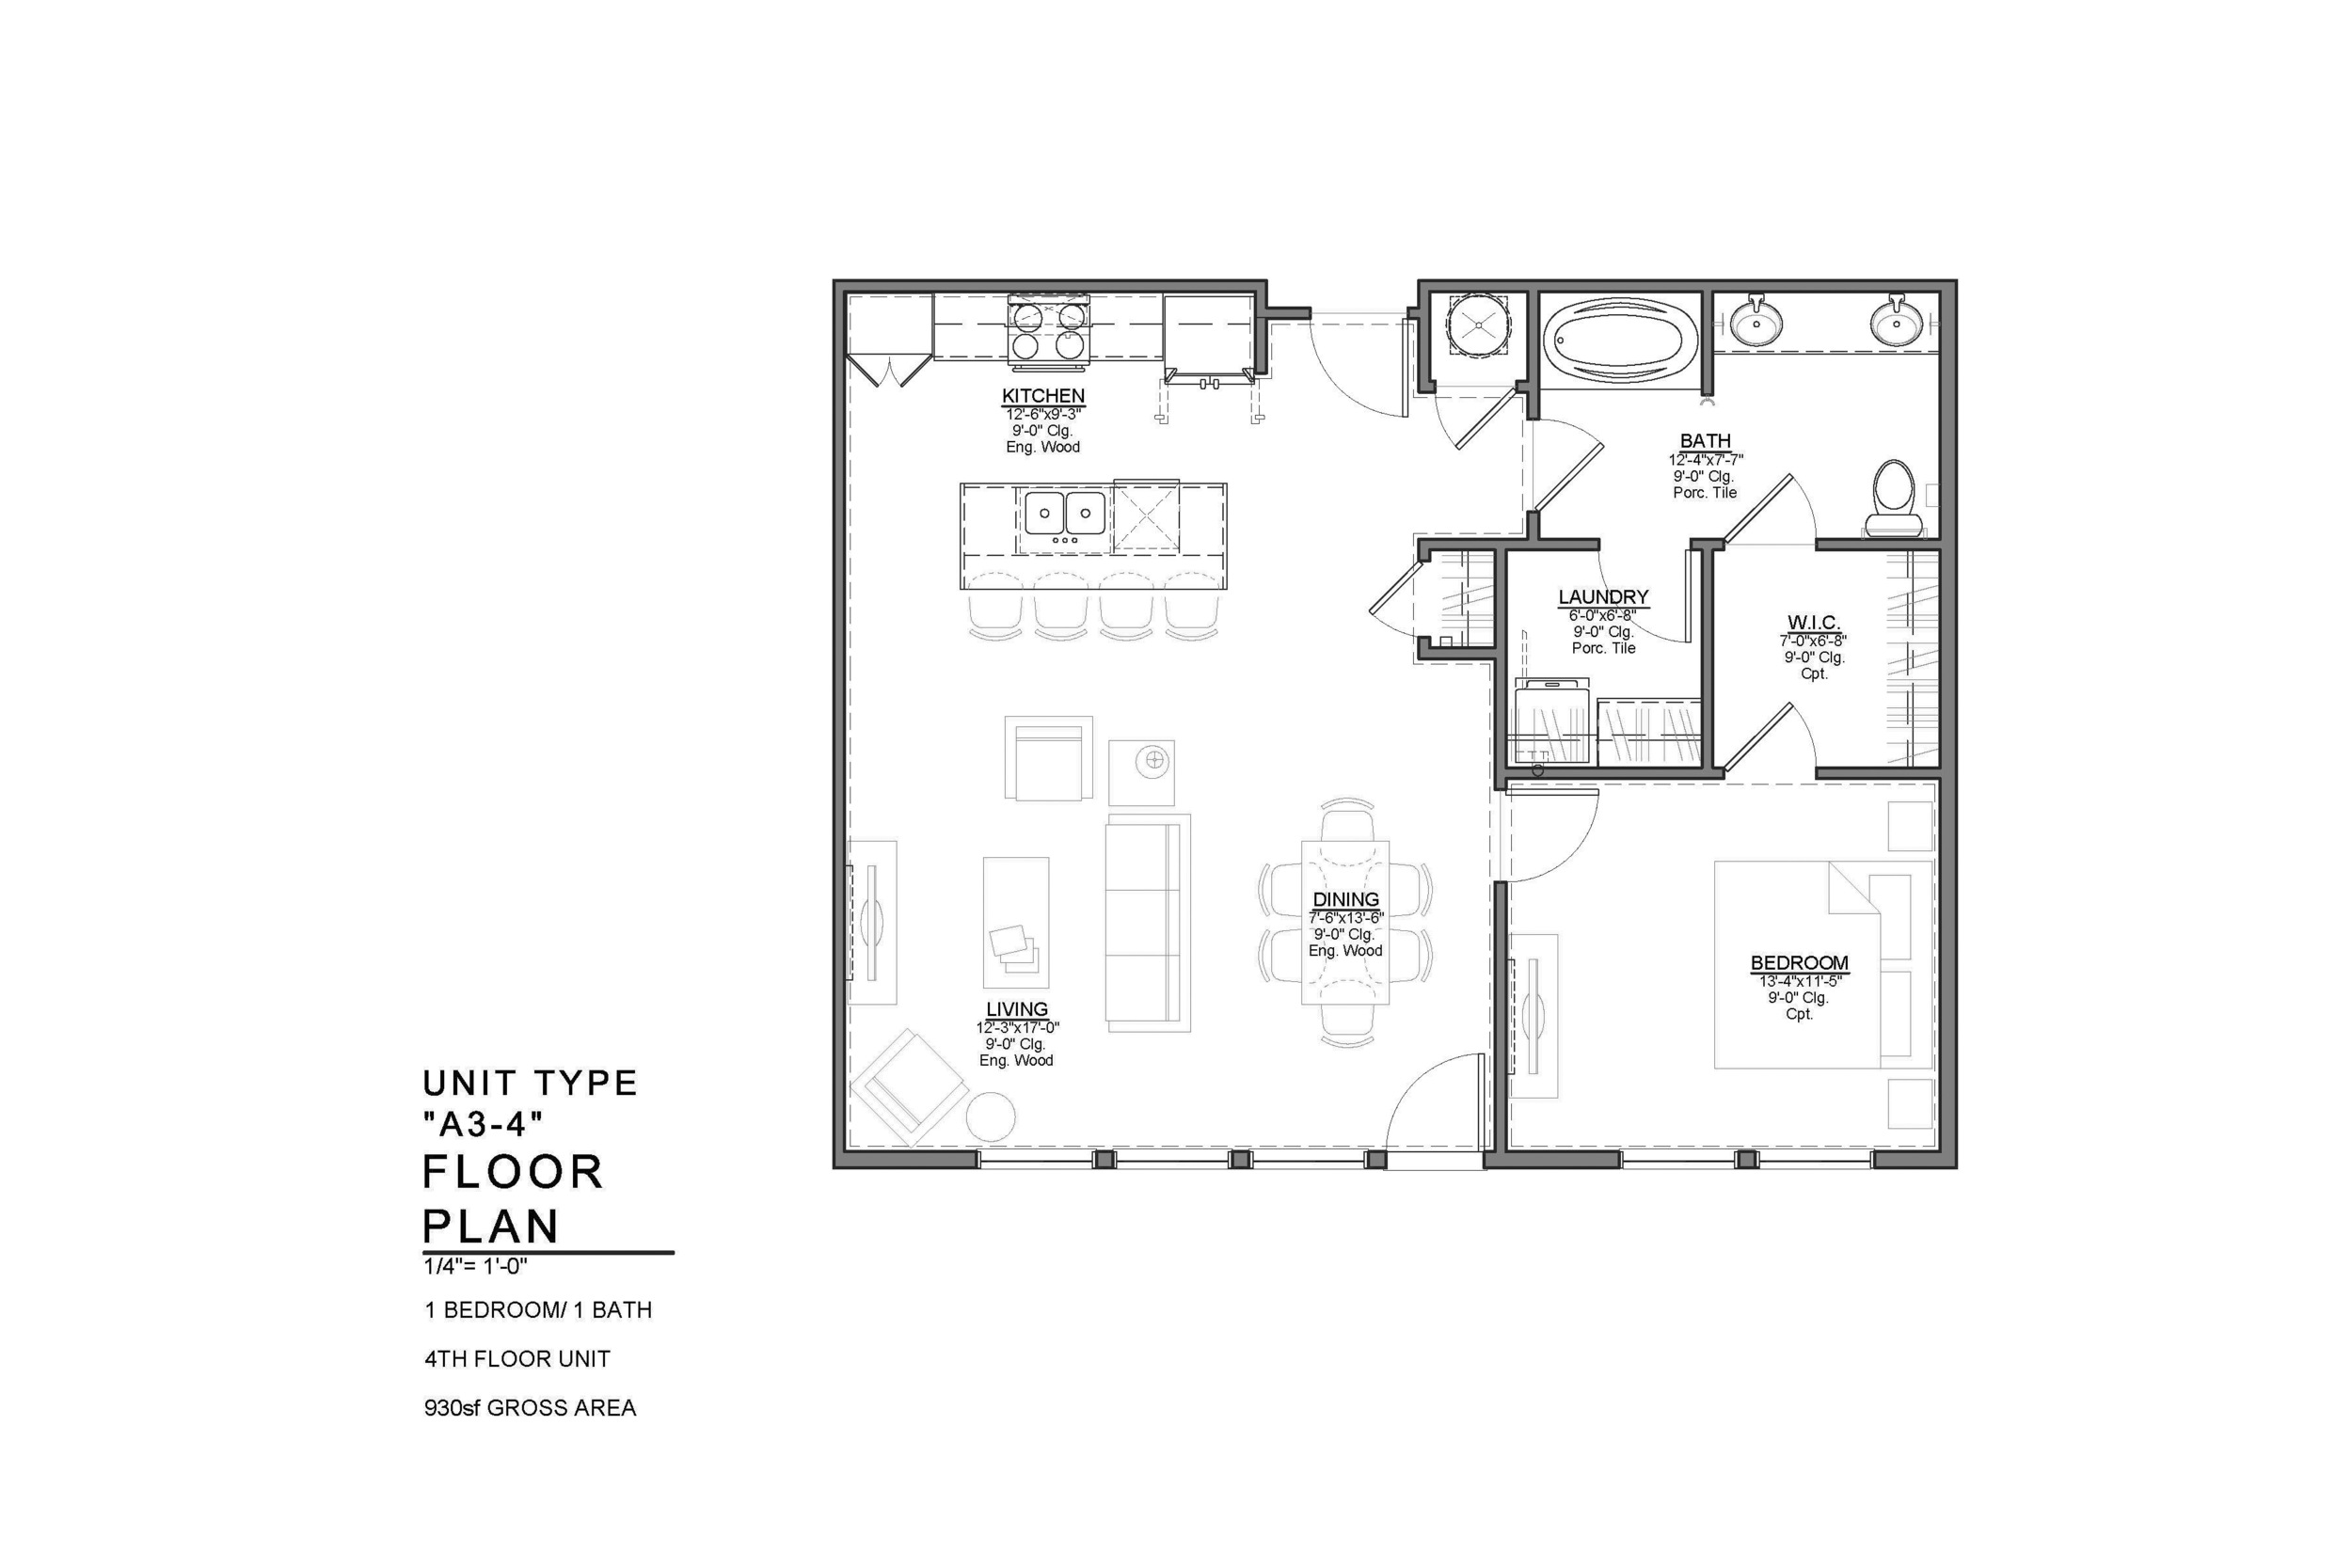 A3-4 FLOOR PLAN: 1 BEDROOM / 1 BATH